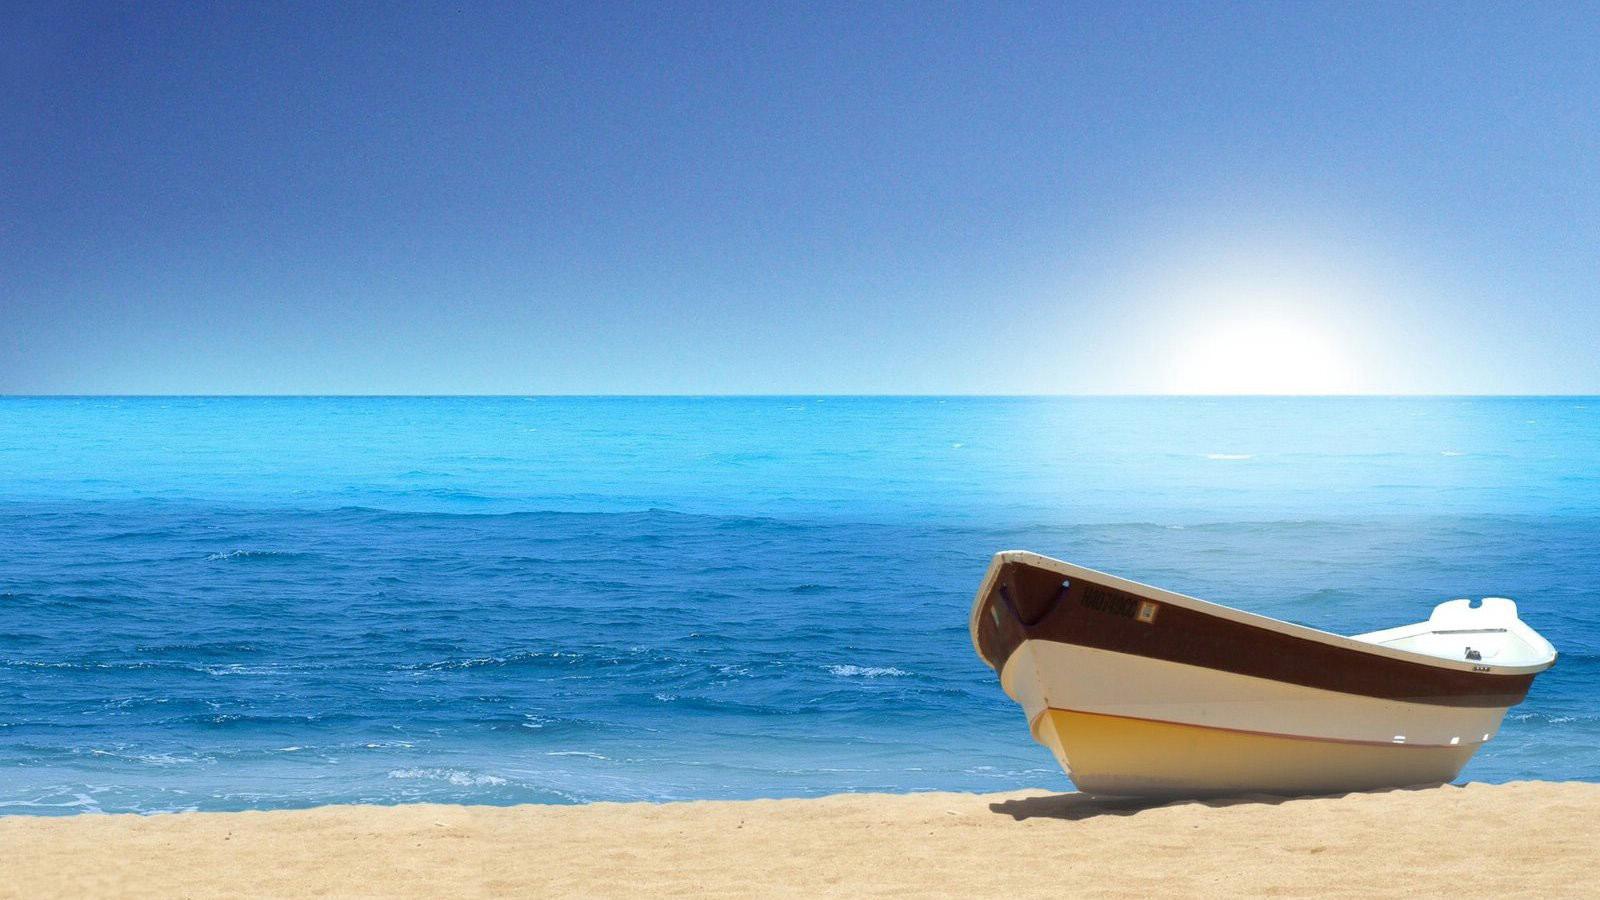 Boat For Sail  1280x800 Pixel   Images 6662   Photoinpixel  HD HD Wallpaper